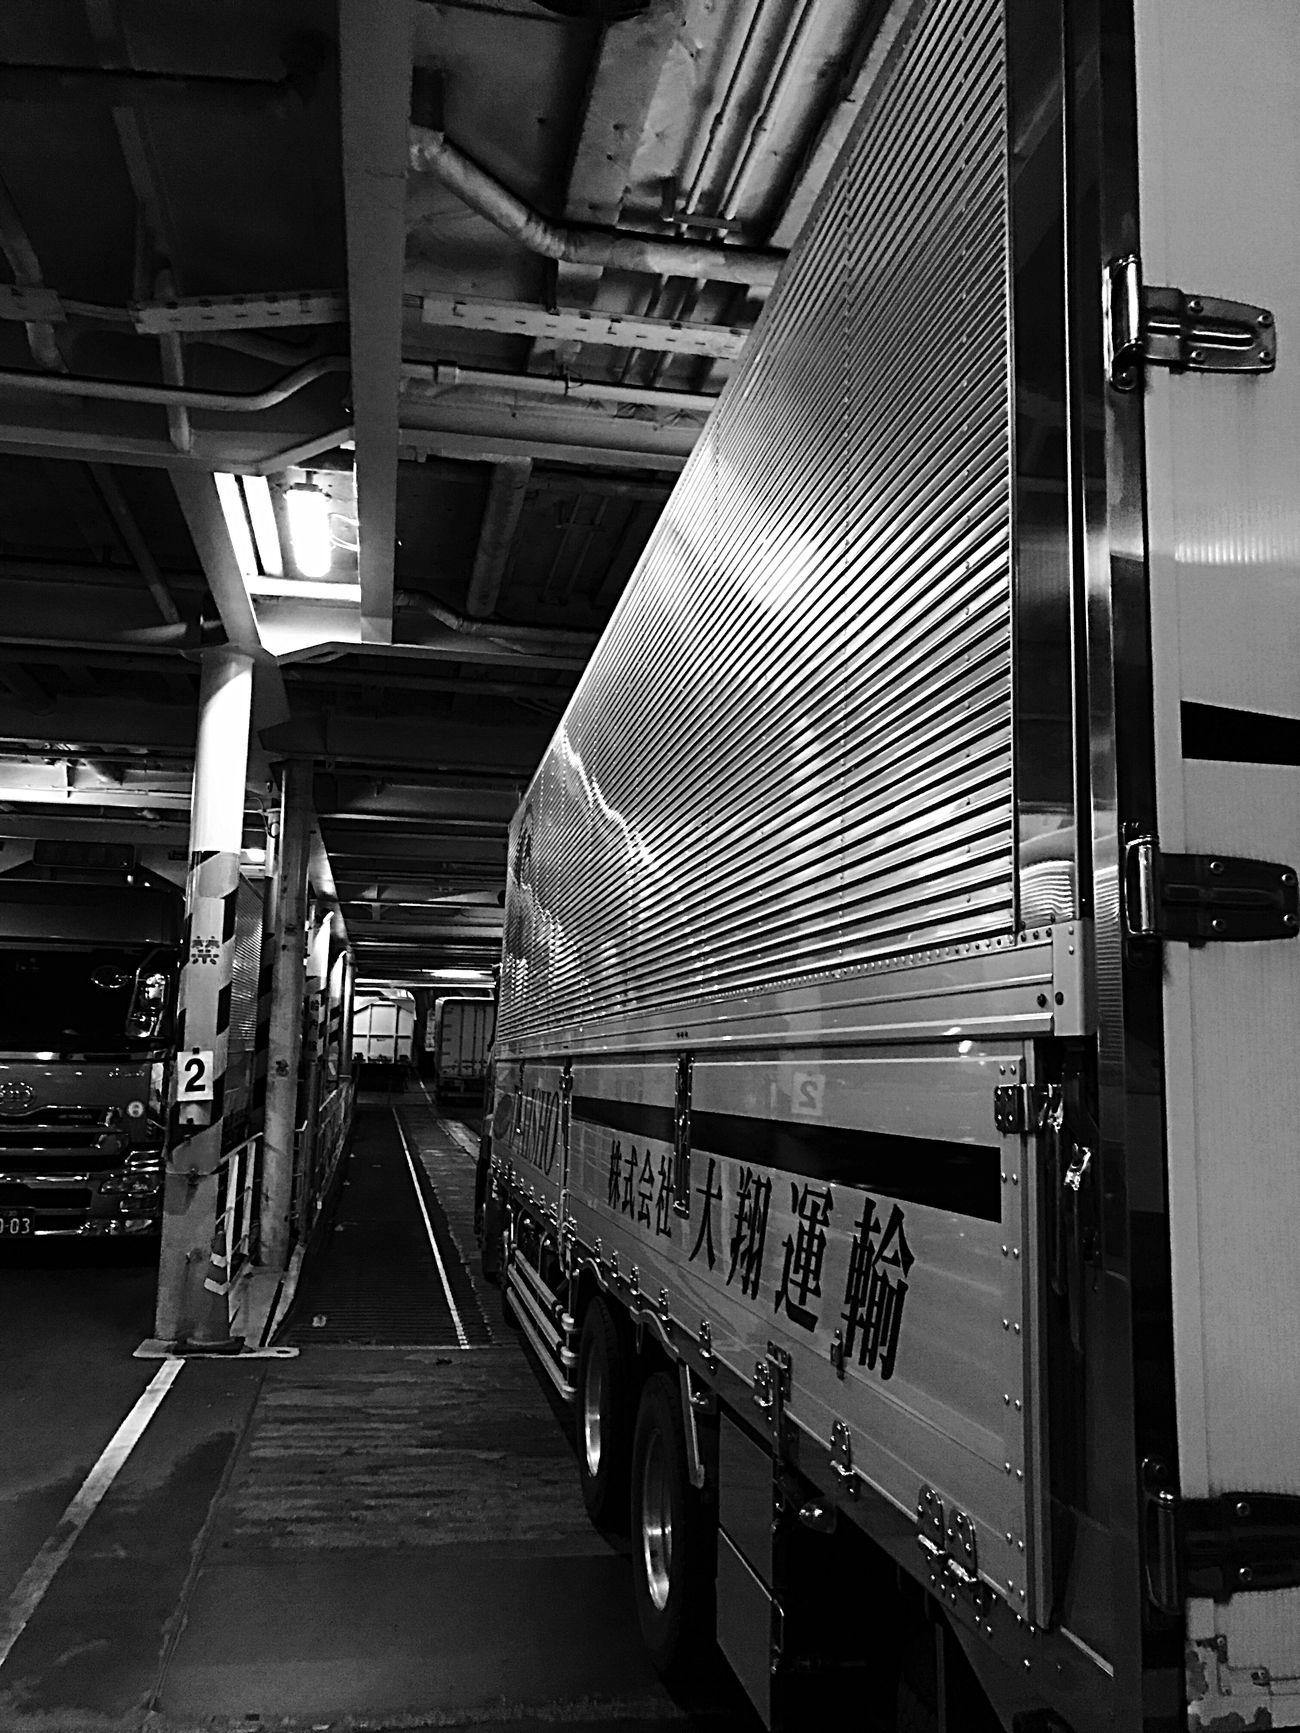 Light And Shadow EyeEm Japan Photography Black And White EyeEm Japan Trucking Truck Enjoying Life Japan EyeEm Gallery Nissan Trucks EyeEmBestPics Self Portrait EyeEm Best Shots EyeEm Best Edits